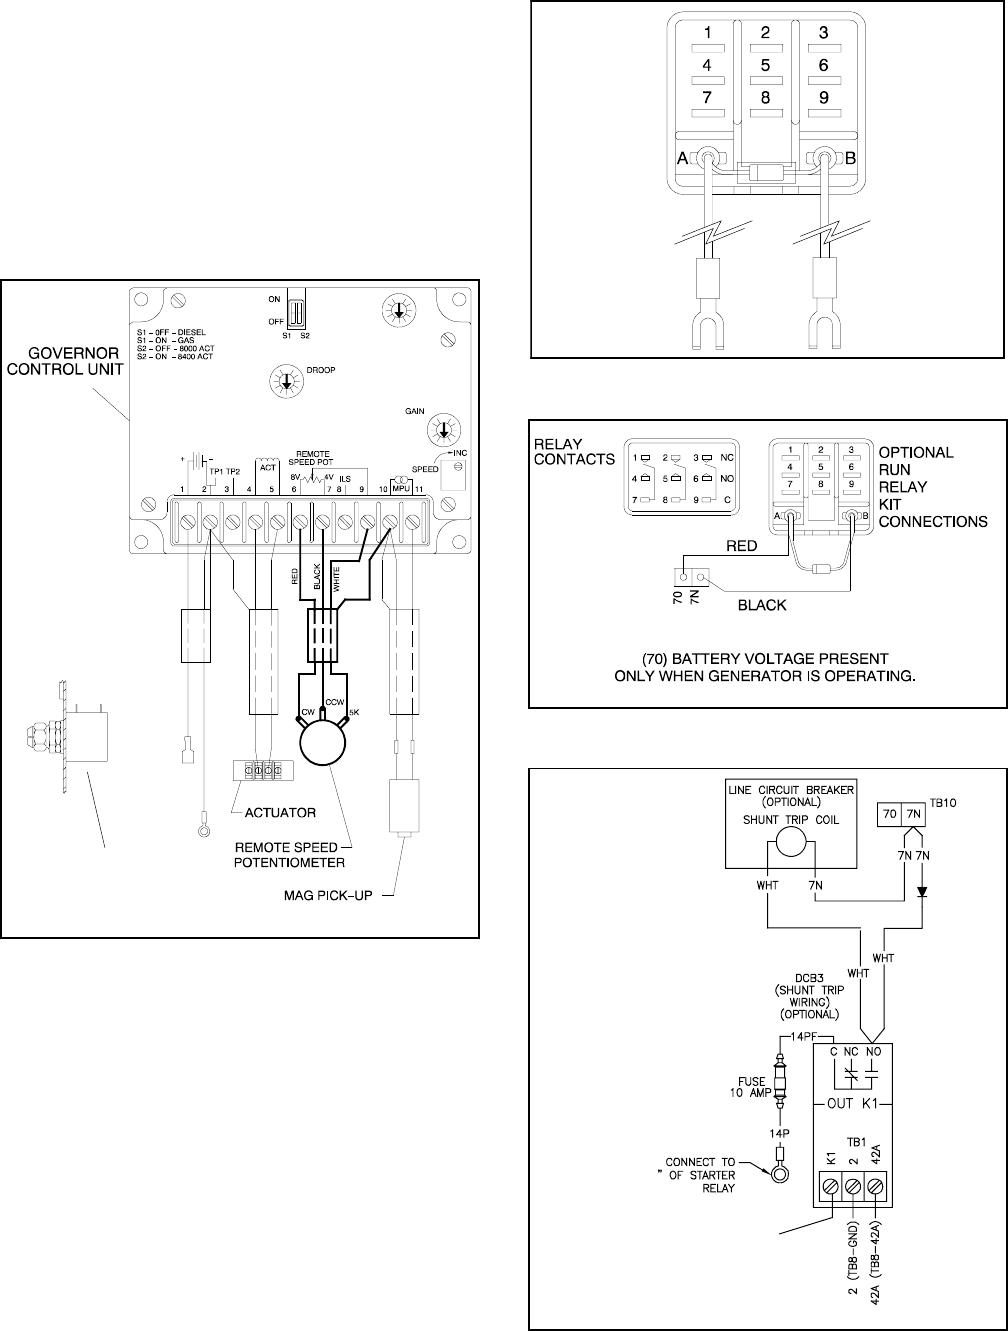 Kohler Wiring Abbreviations Diagrams Schematics Diagram 20 3250 Kw 6 1 12 Remote Speed Adjustment Potentiometer Kit Rh Manualsdump Com Toyota Electrical Wire Type Chart